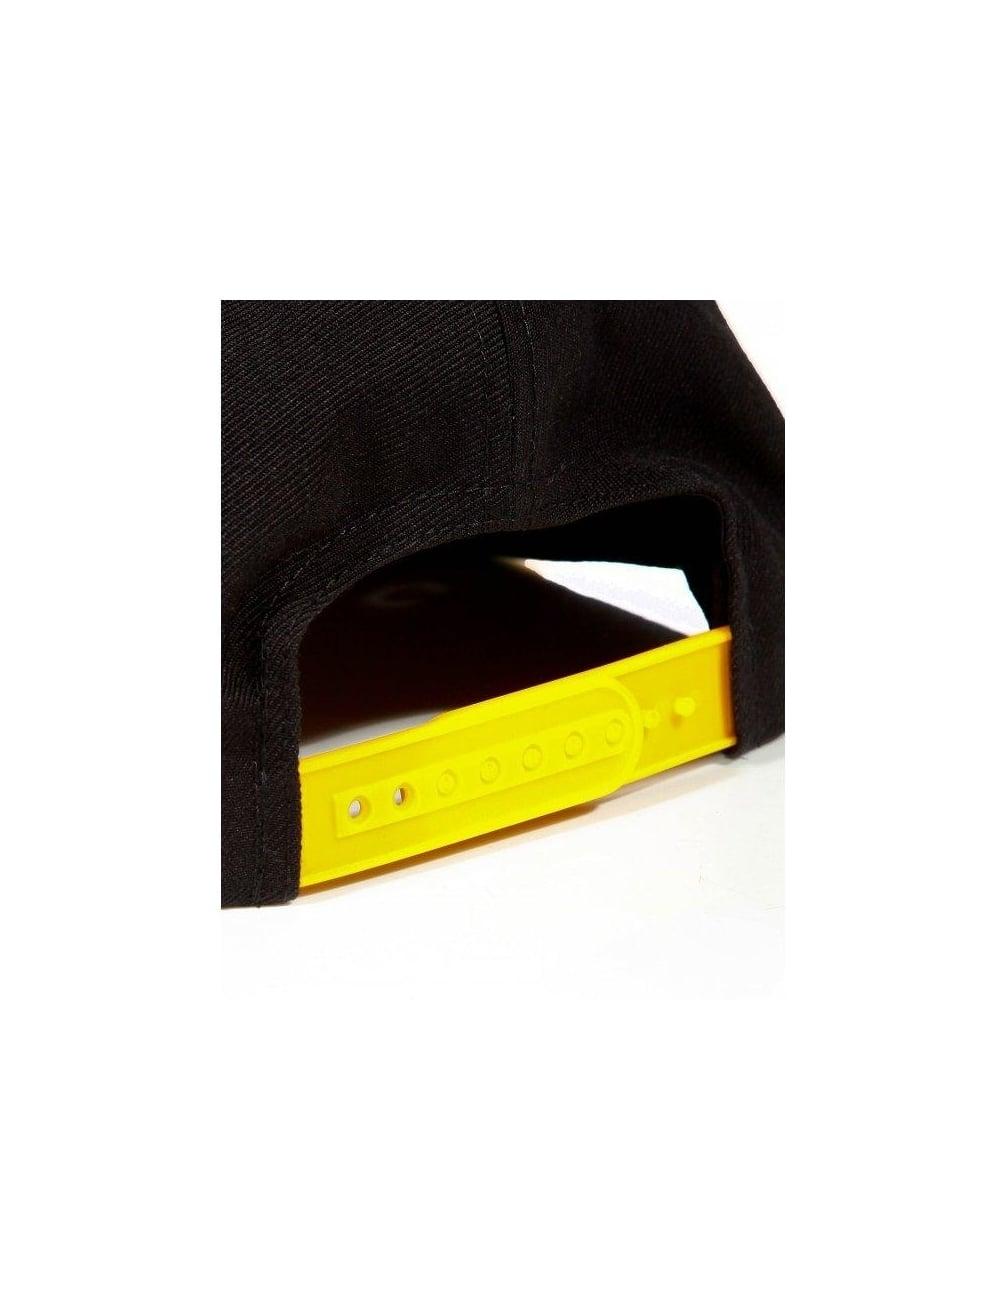 Obey Clothing Throwback Snapback Black//Gold